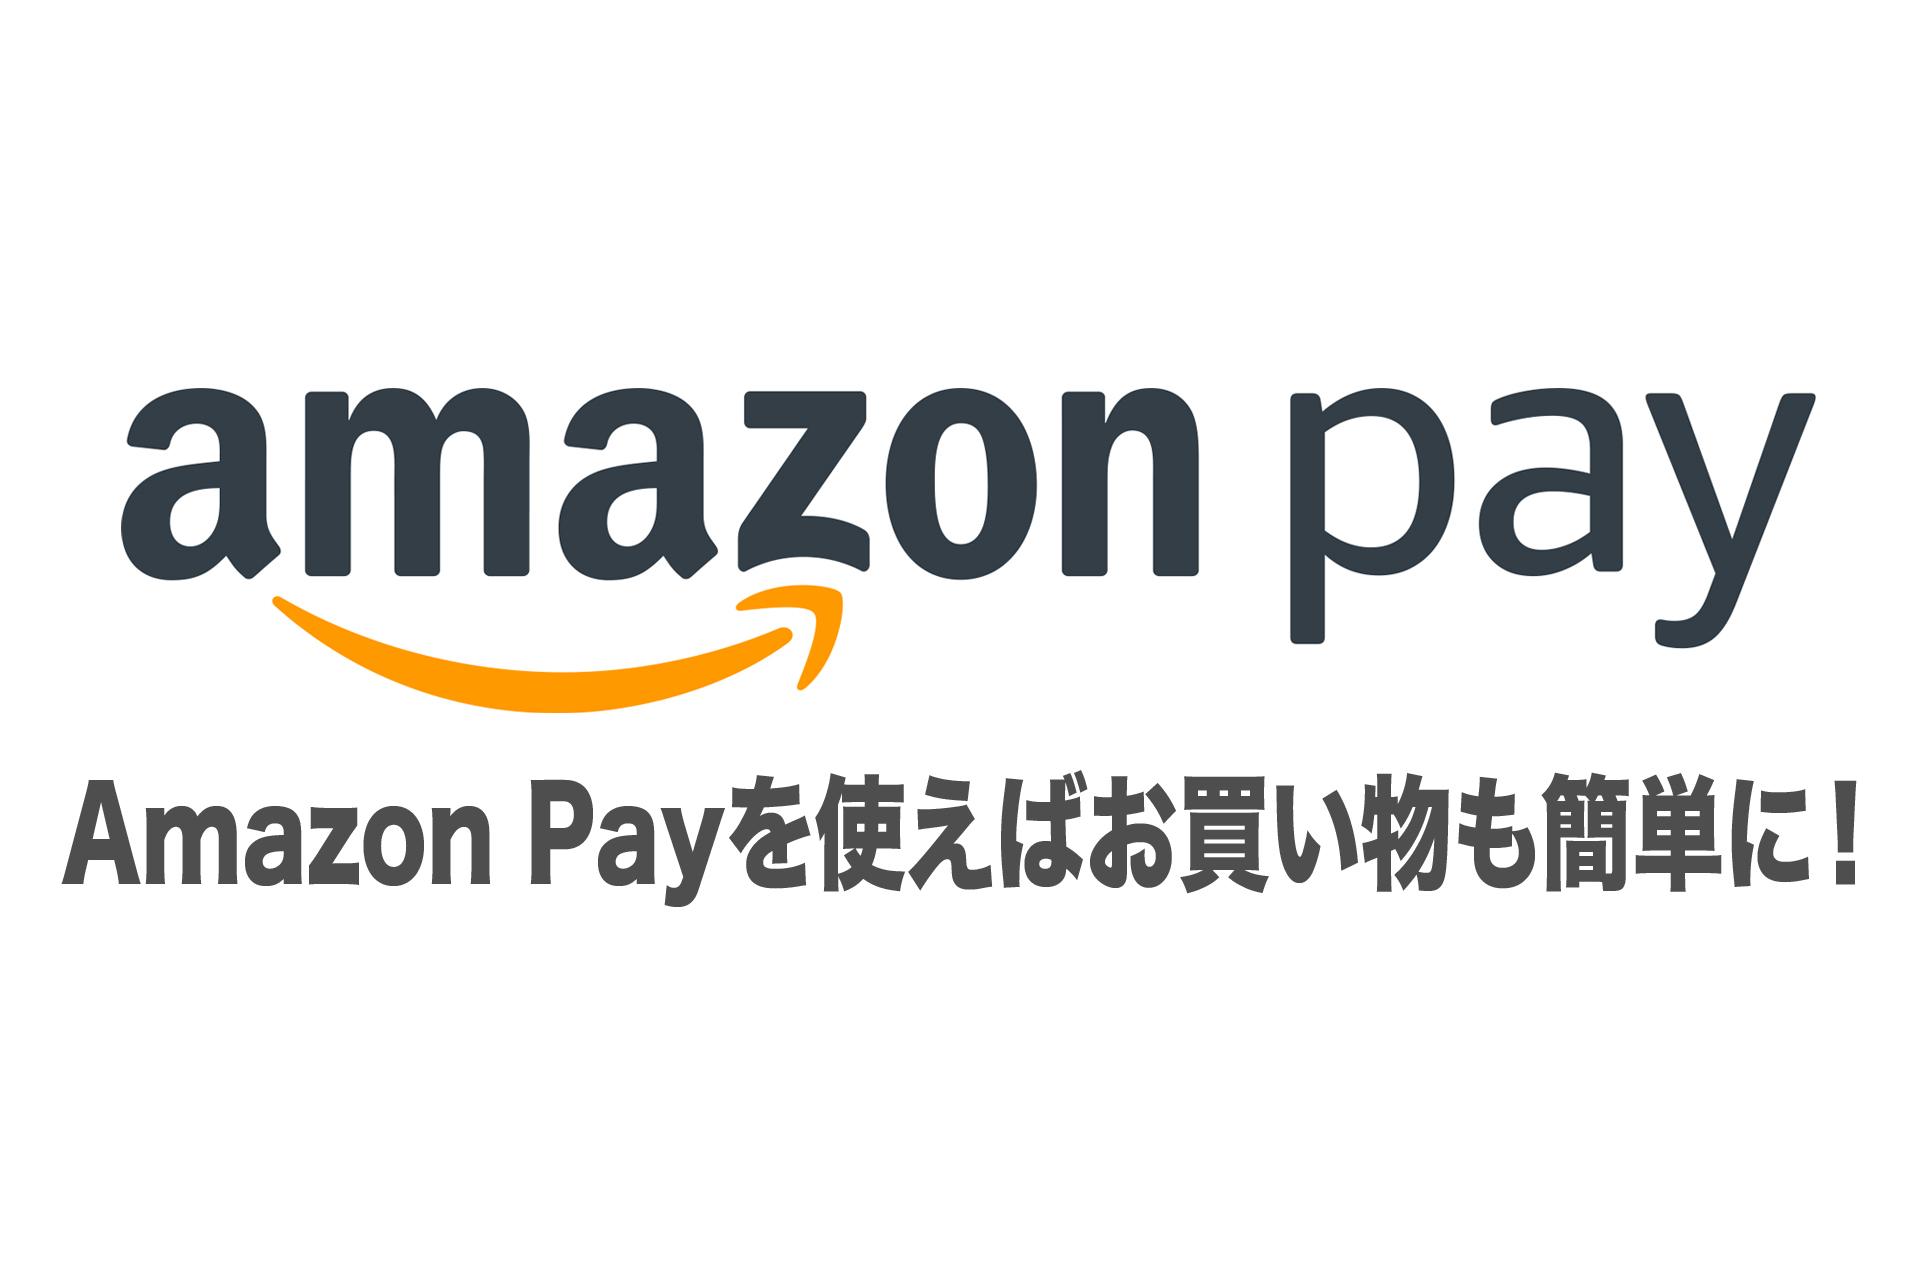 Amazon Payを使えばお買い物も簡単に!